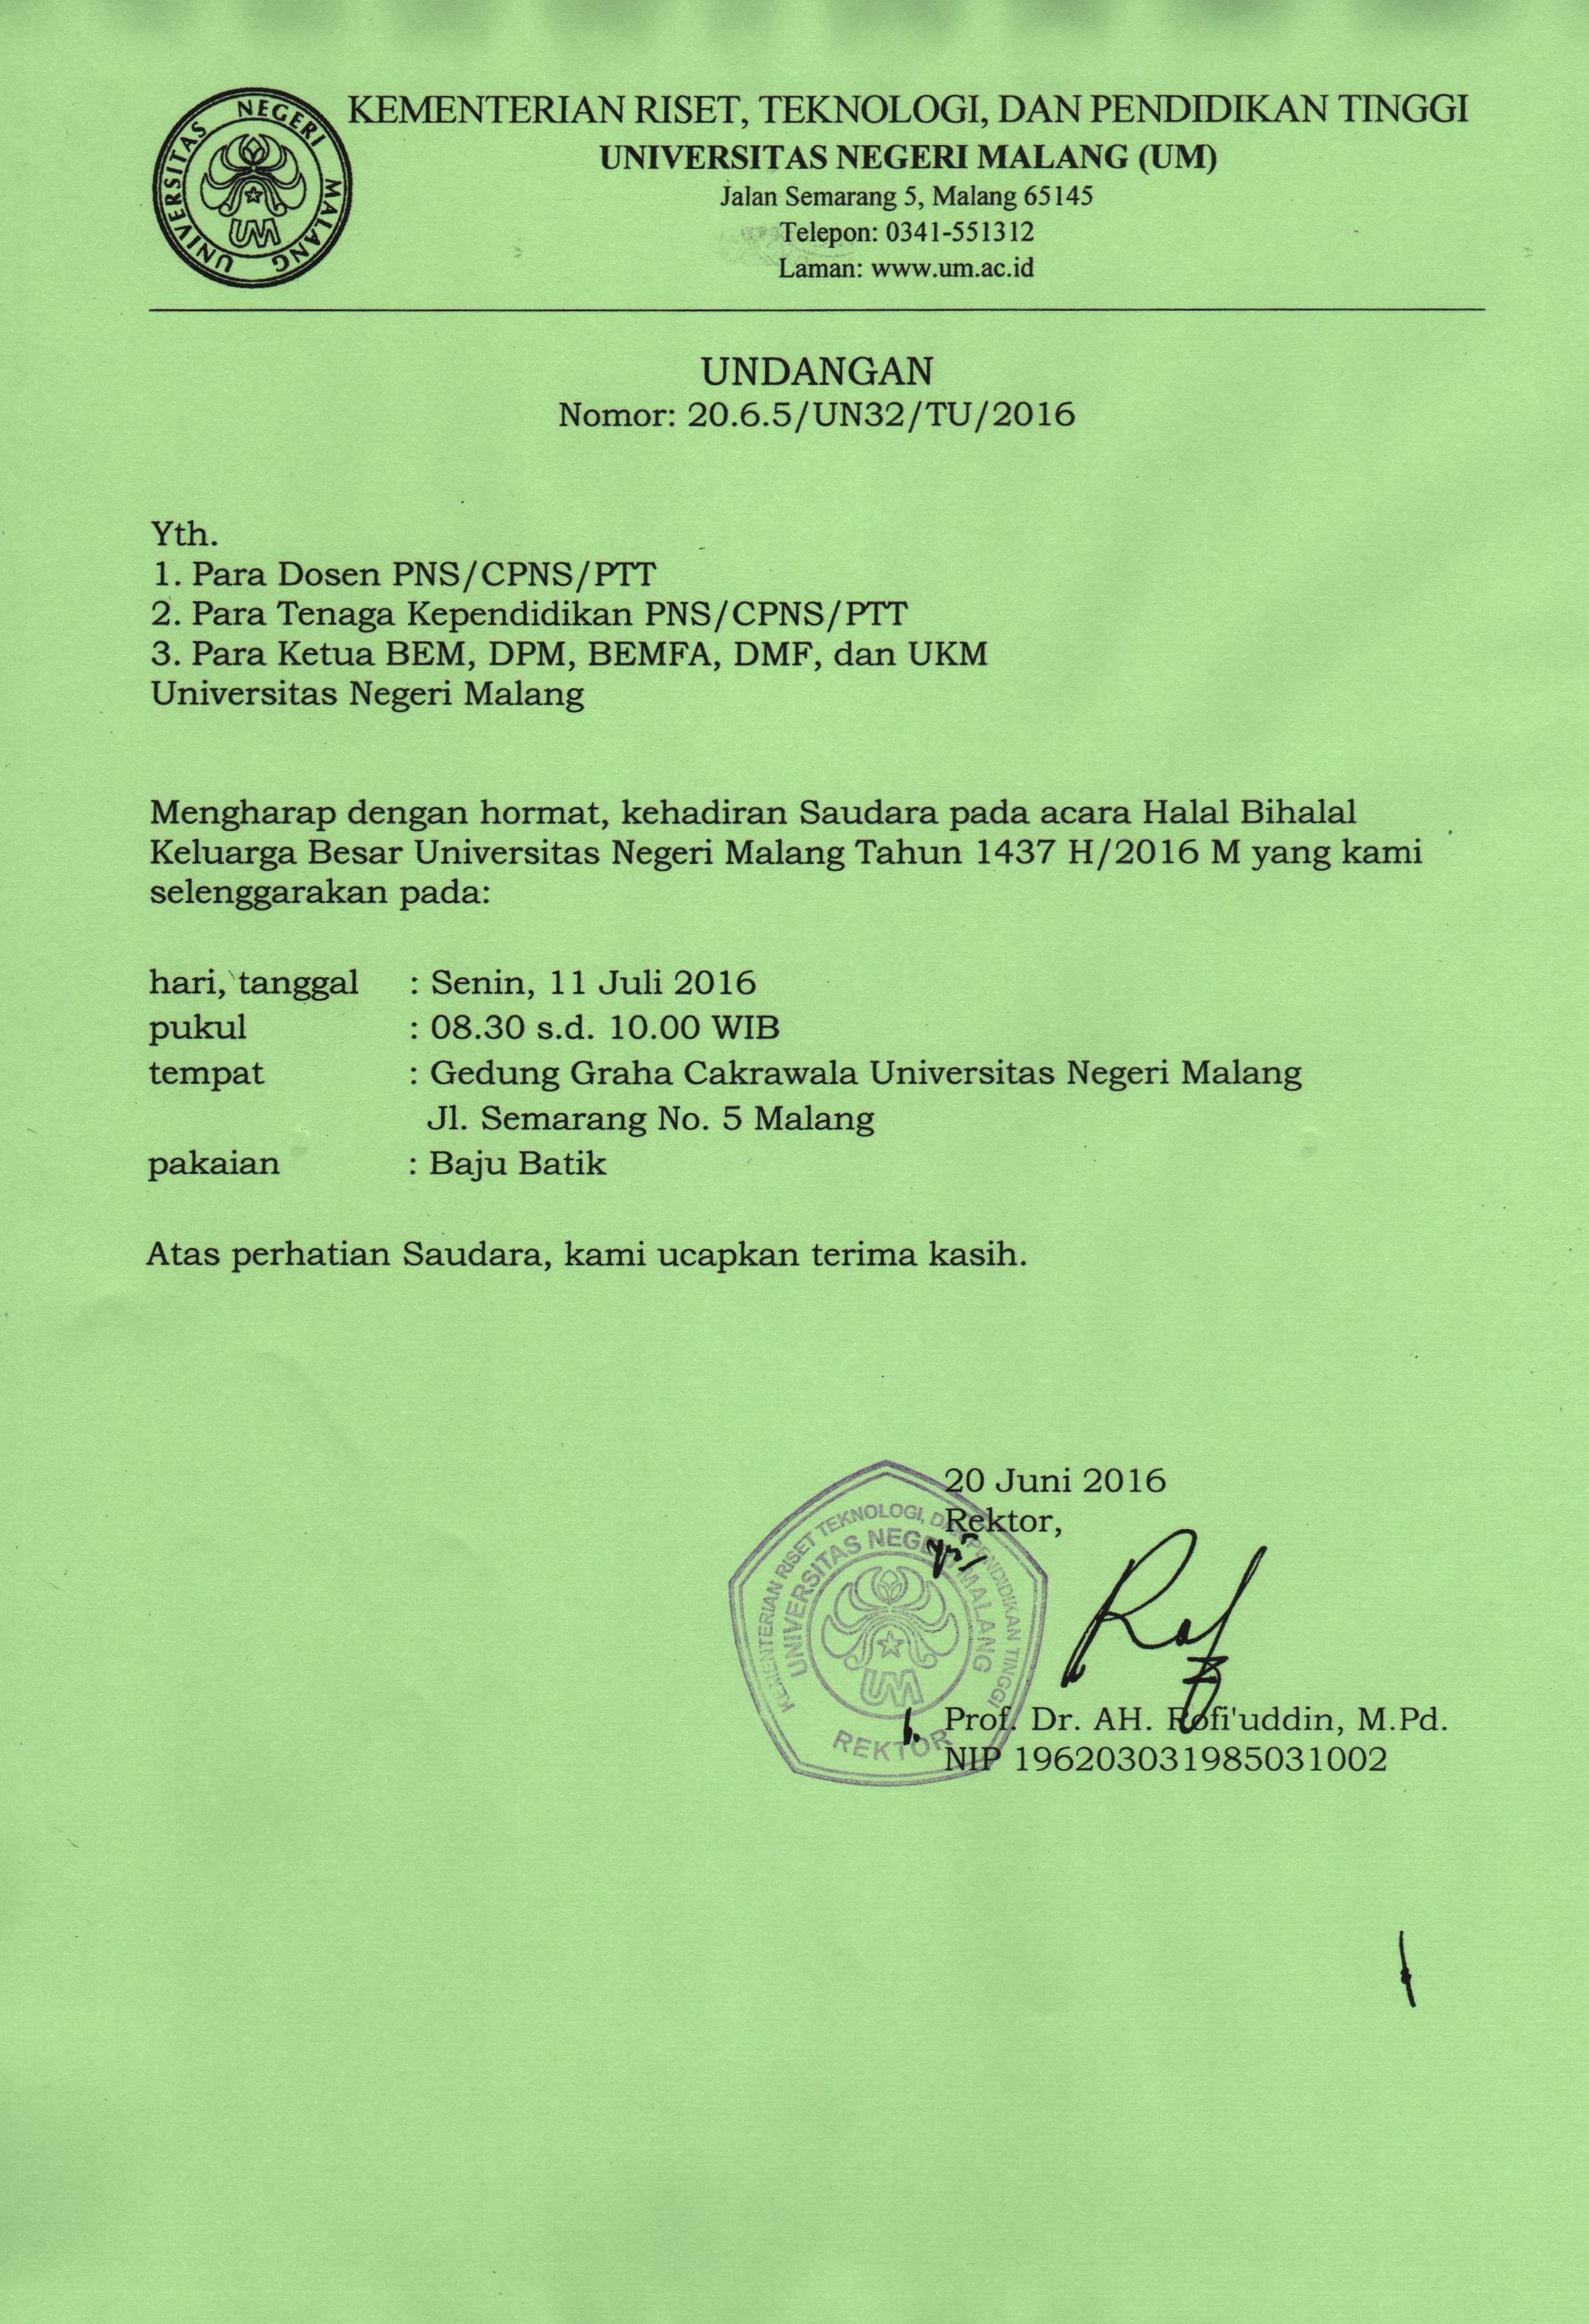 Undangan Halal Bi Halal Biro Umum Dan Keuangan Buk